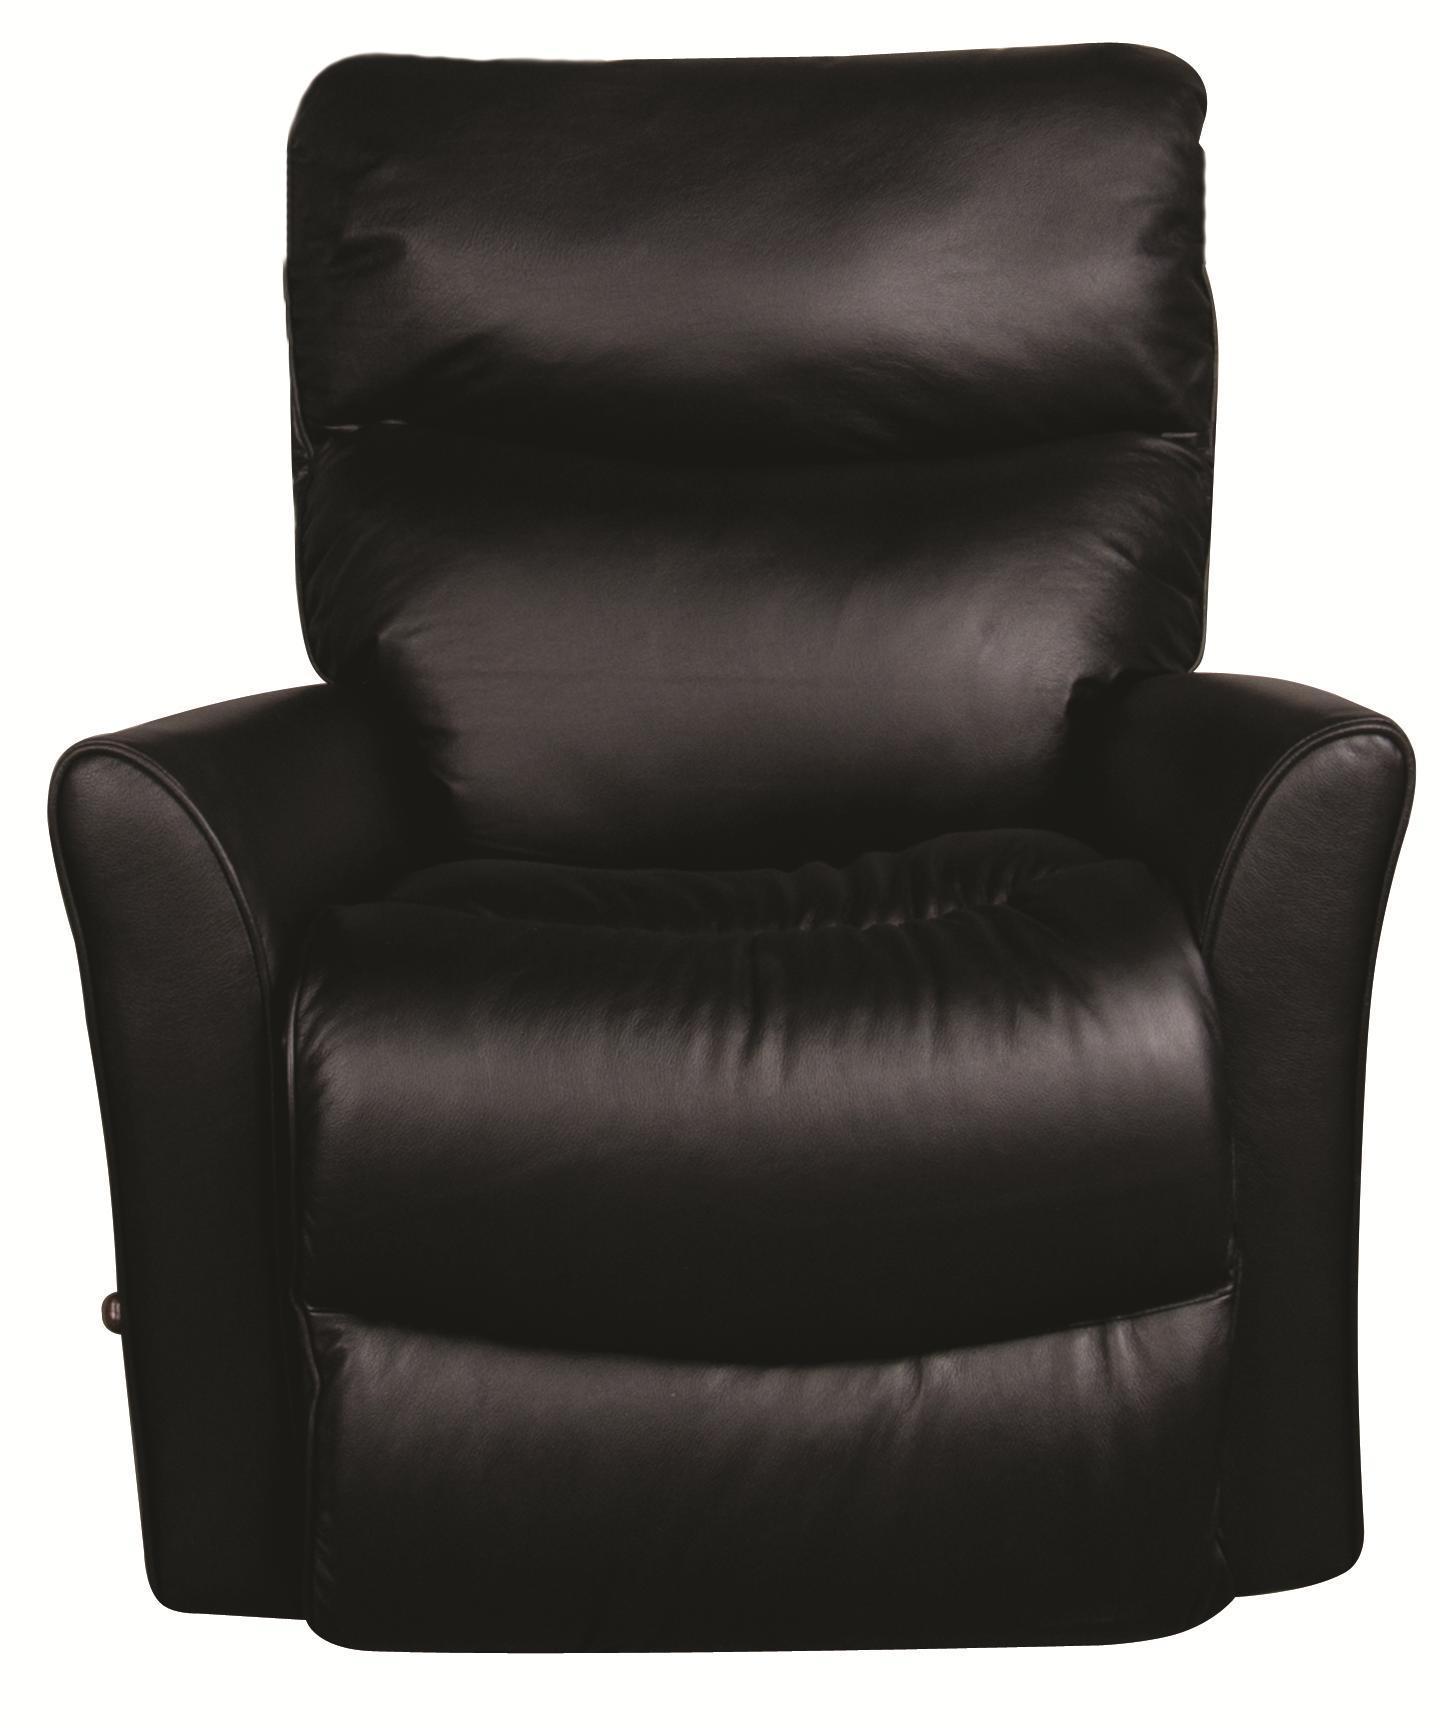 lazy boy recliner lift chair. La-Z-Boy Rowan Leather-Match* Rocker Recliner Lazy Boy Lift Chair T